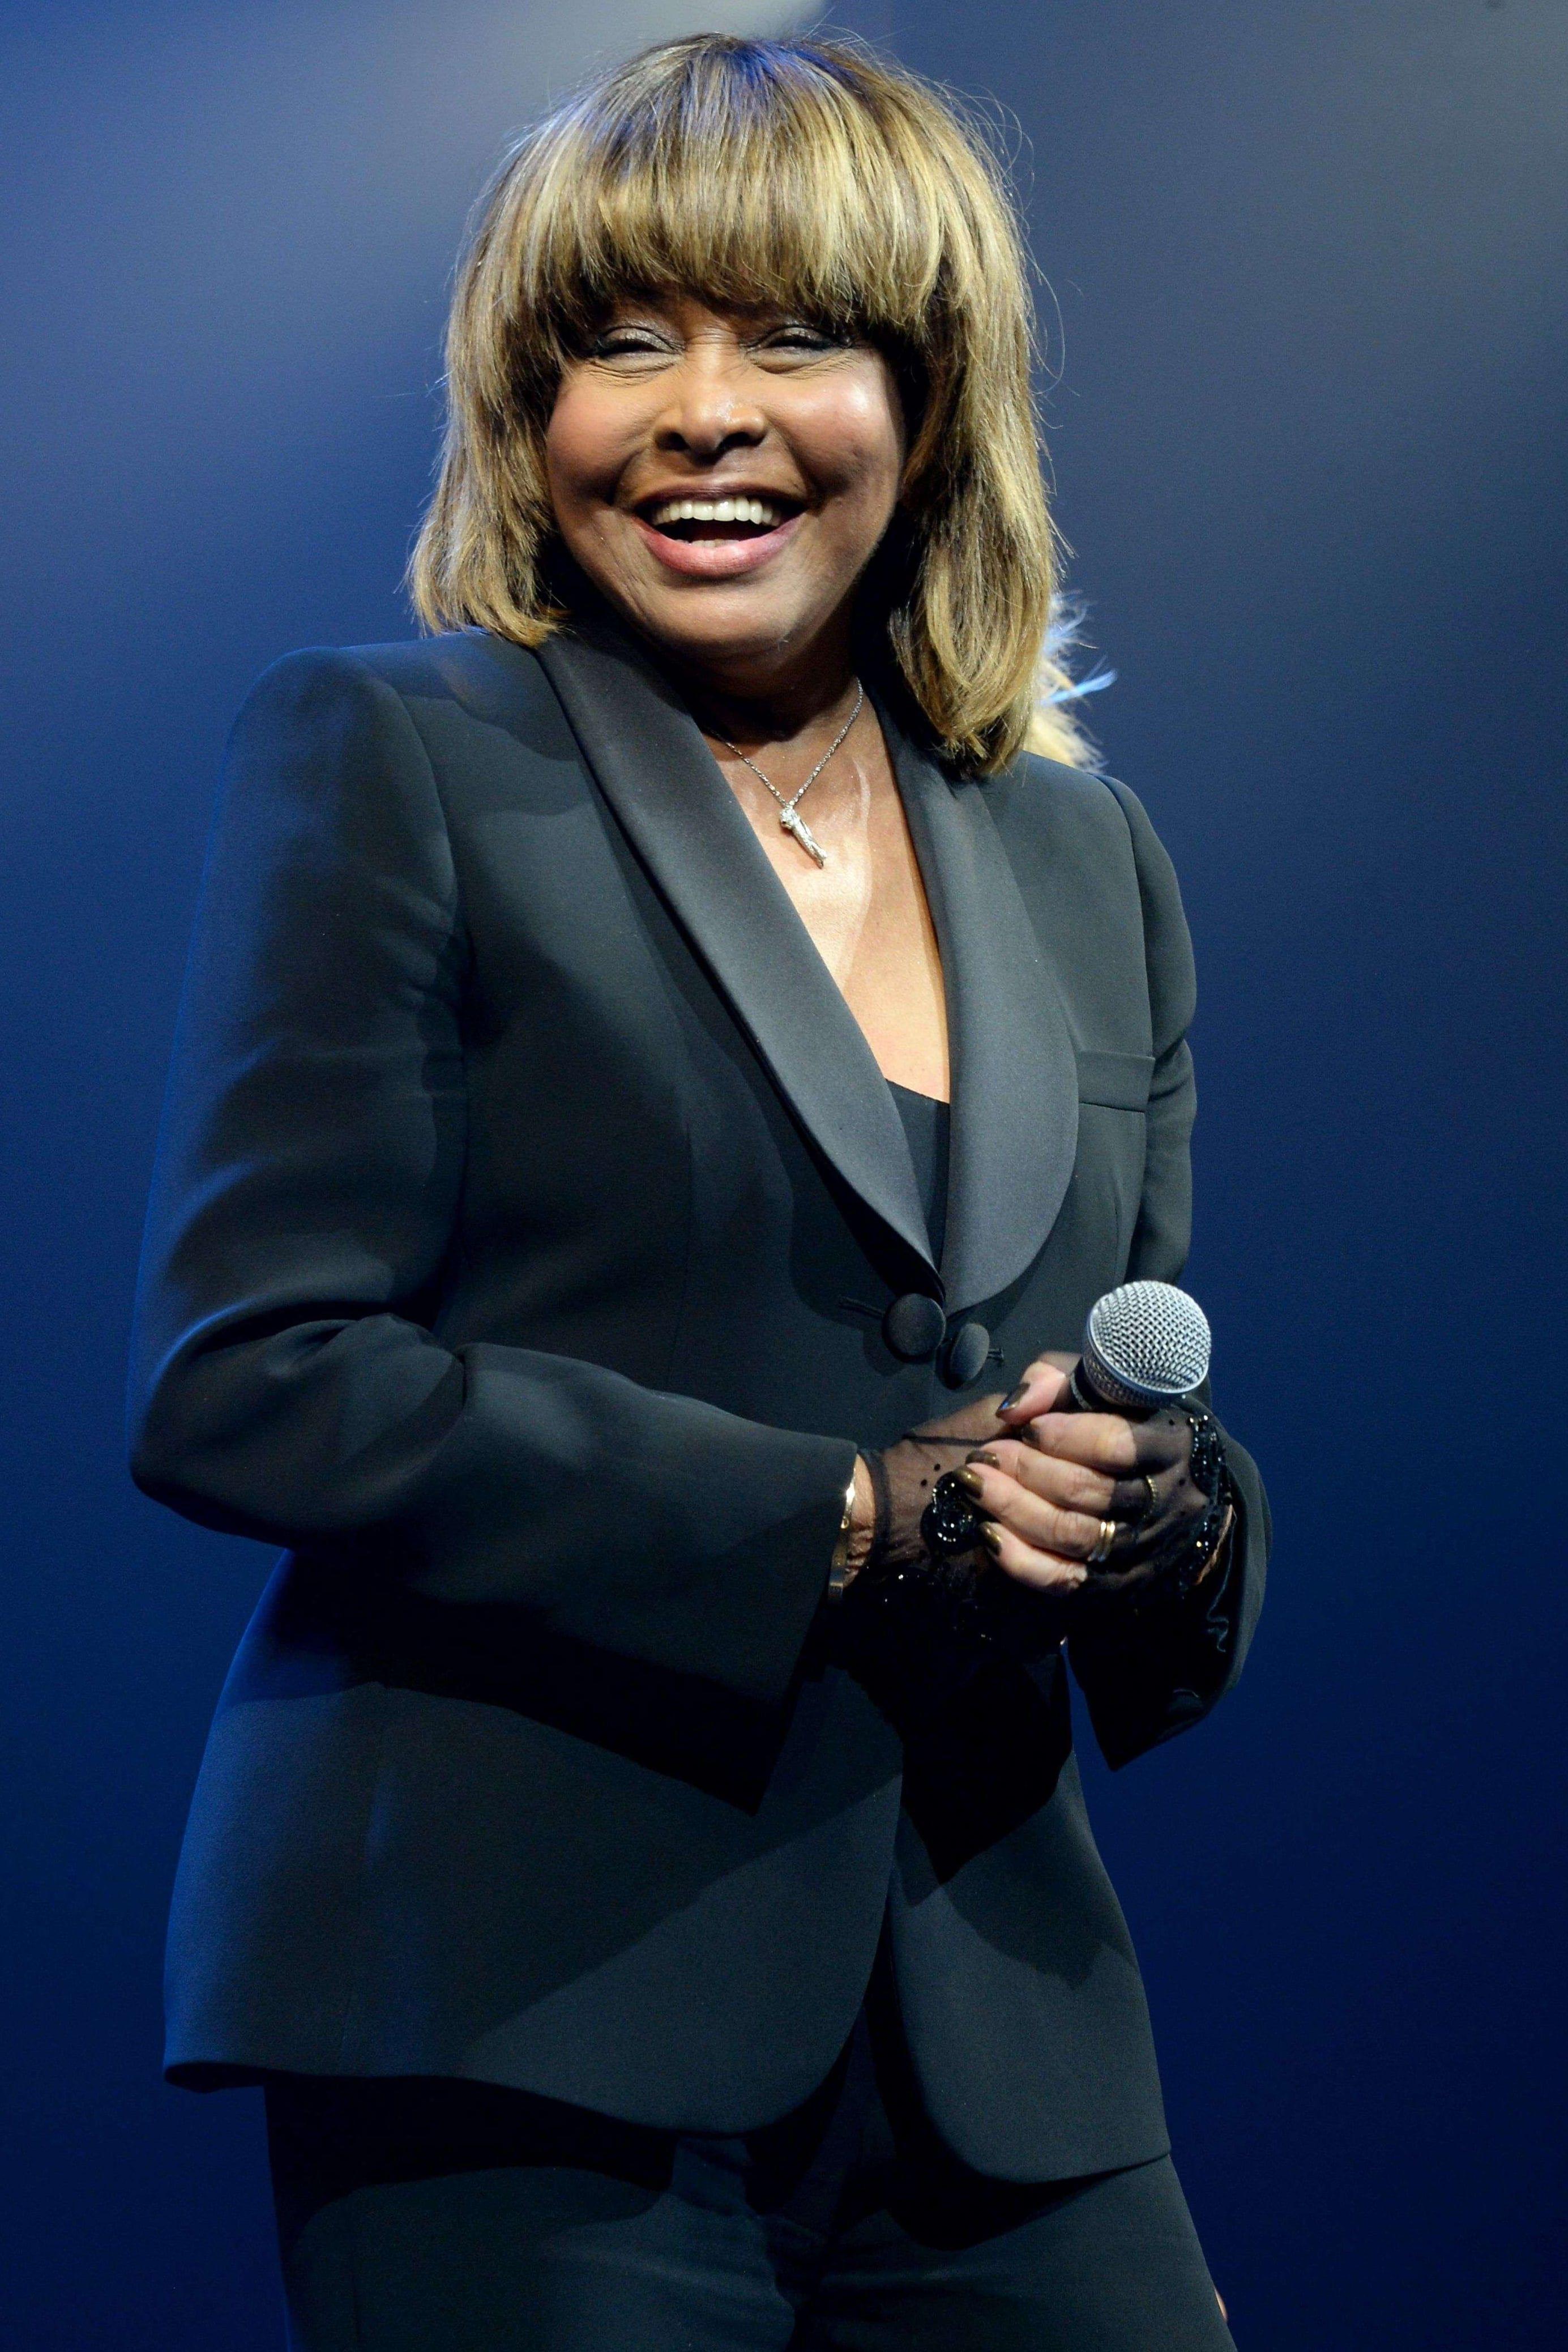 Tina Turner Wiki, Biography, Age, Net Worth, Contact